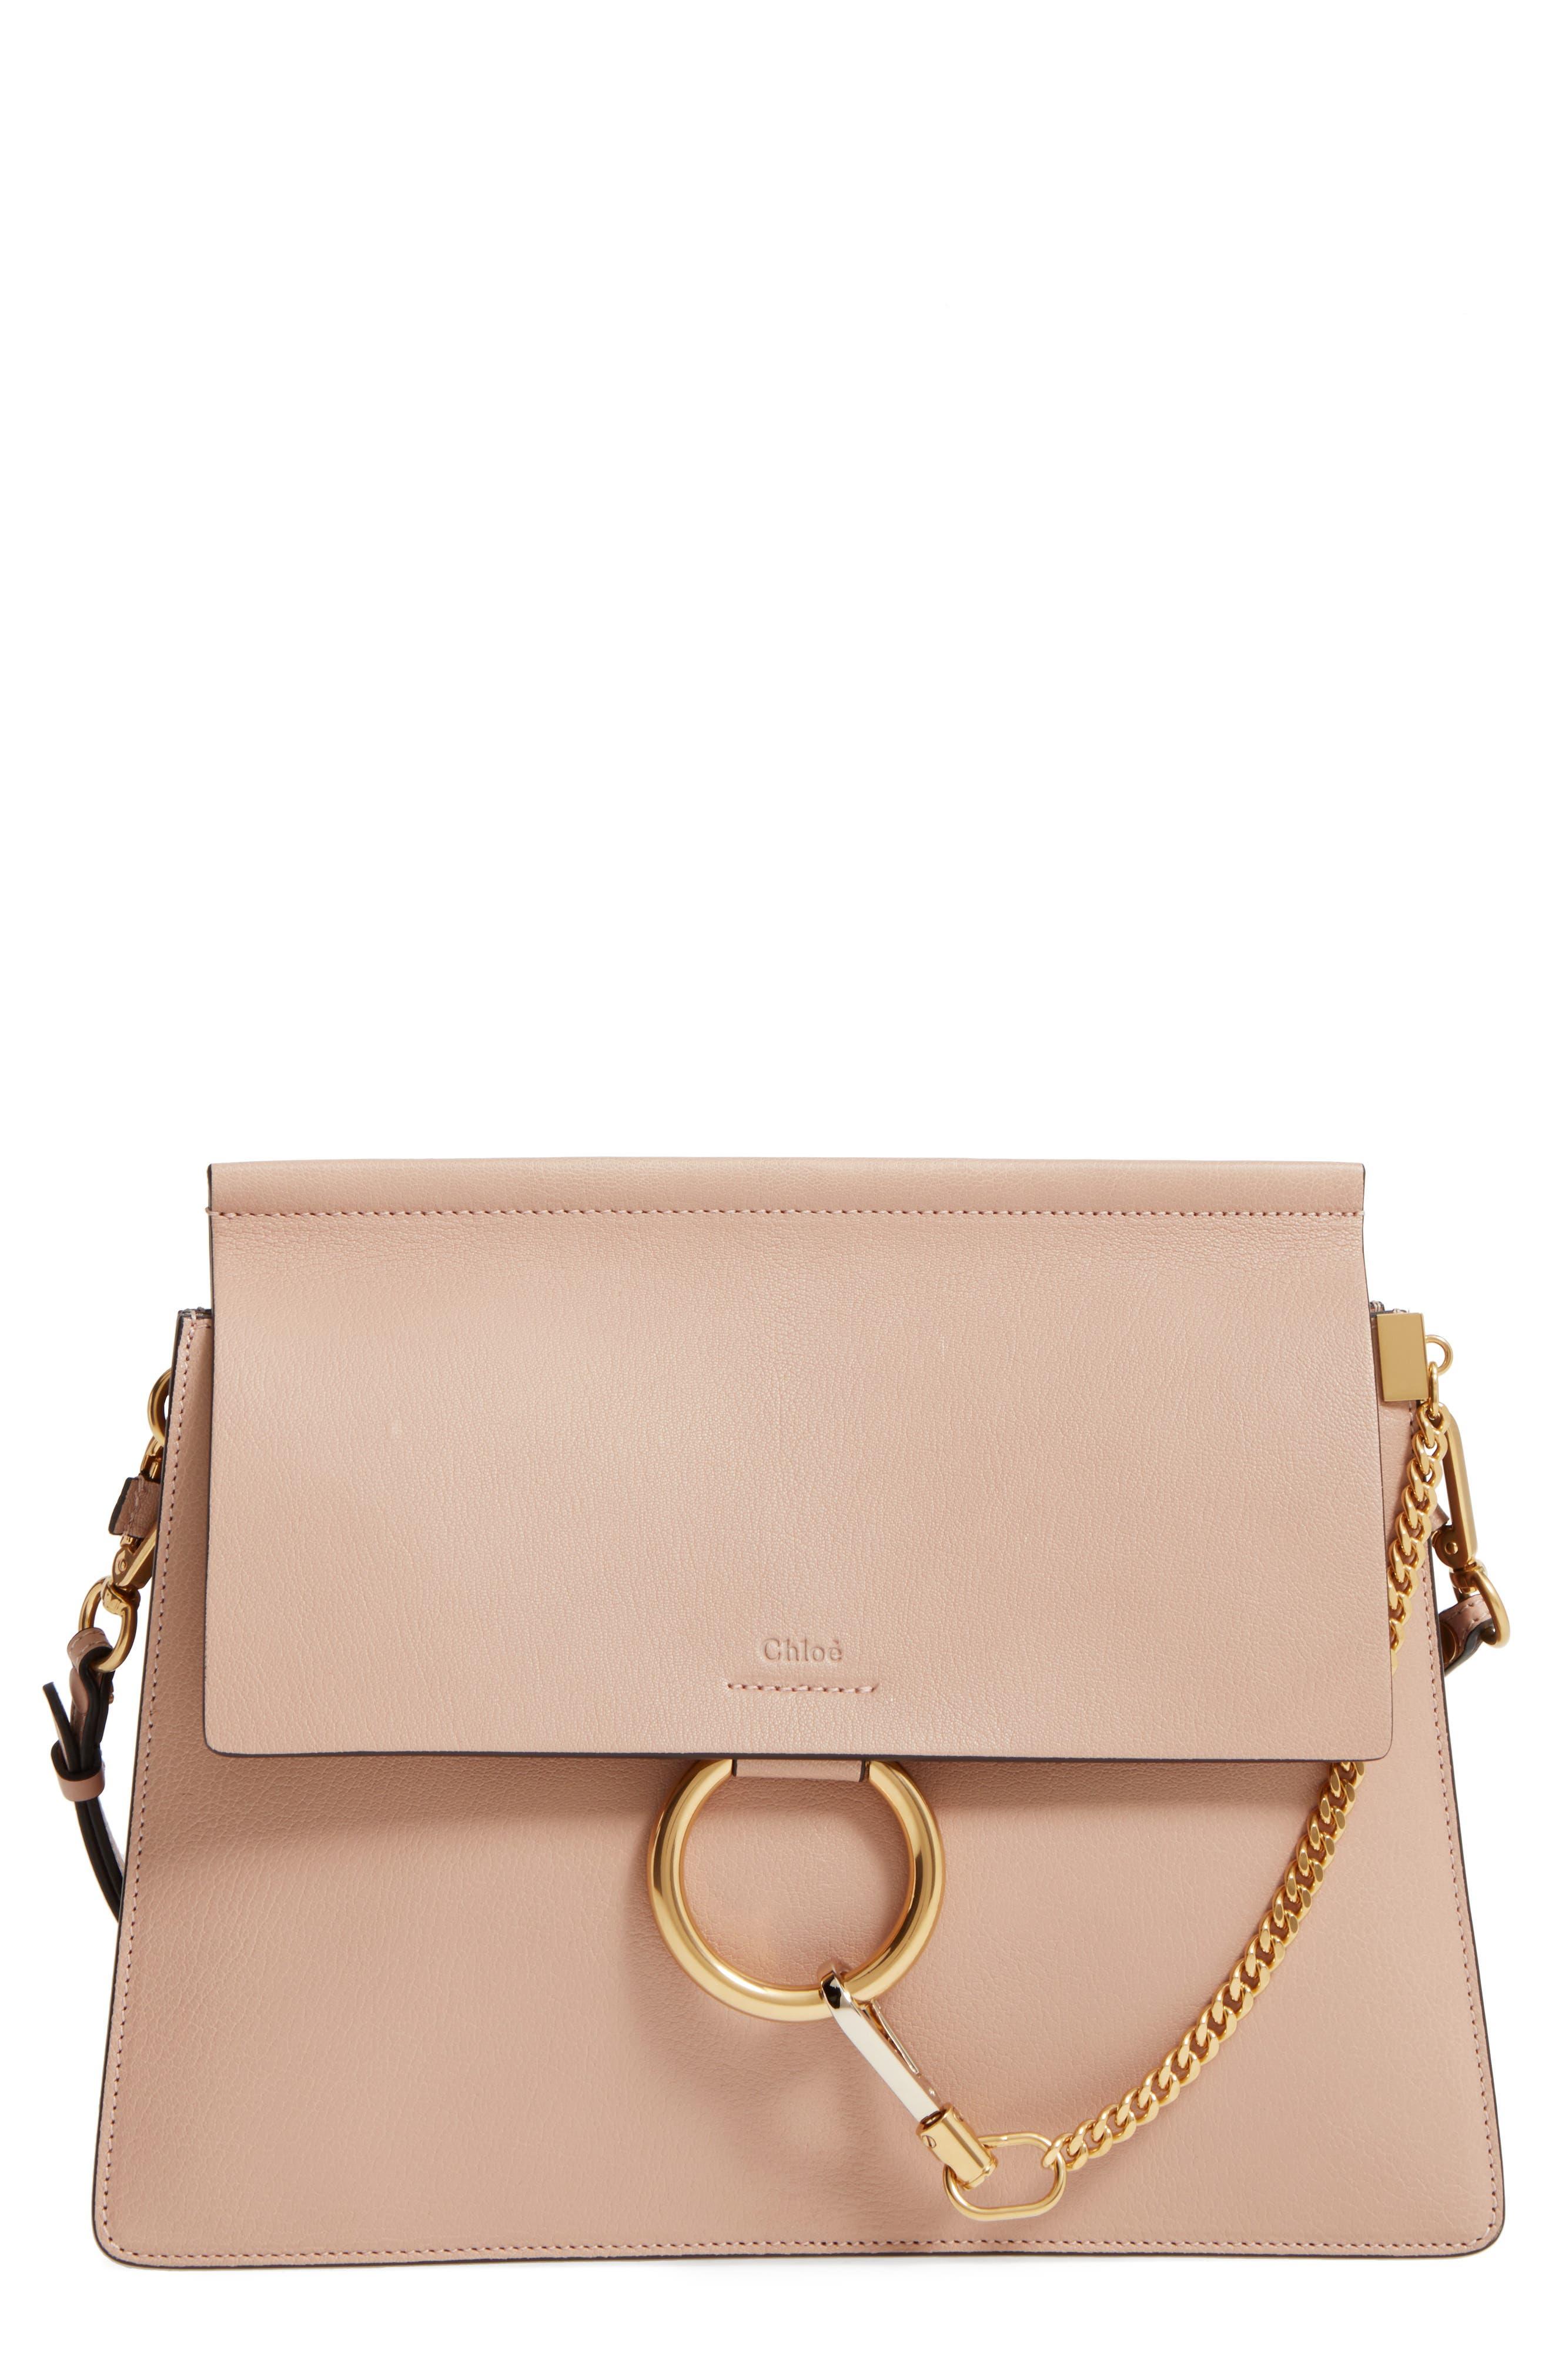 Chloé Faye Goatskin Leather Shoulder Bag